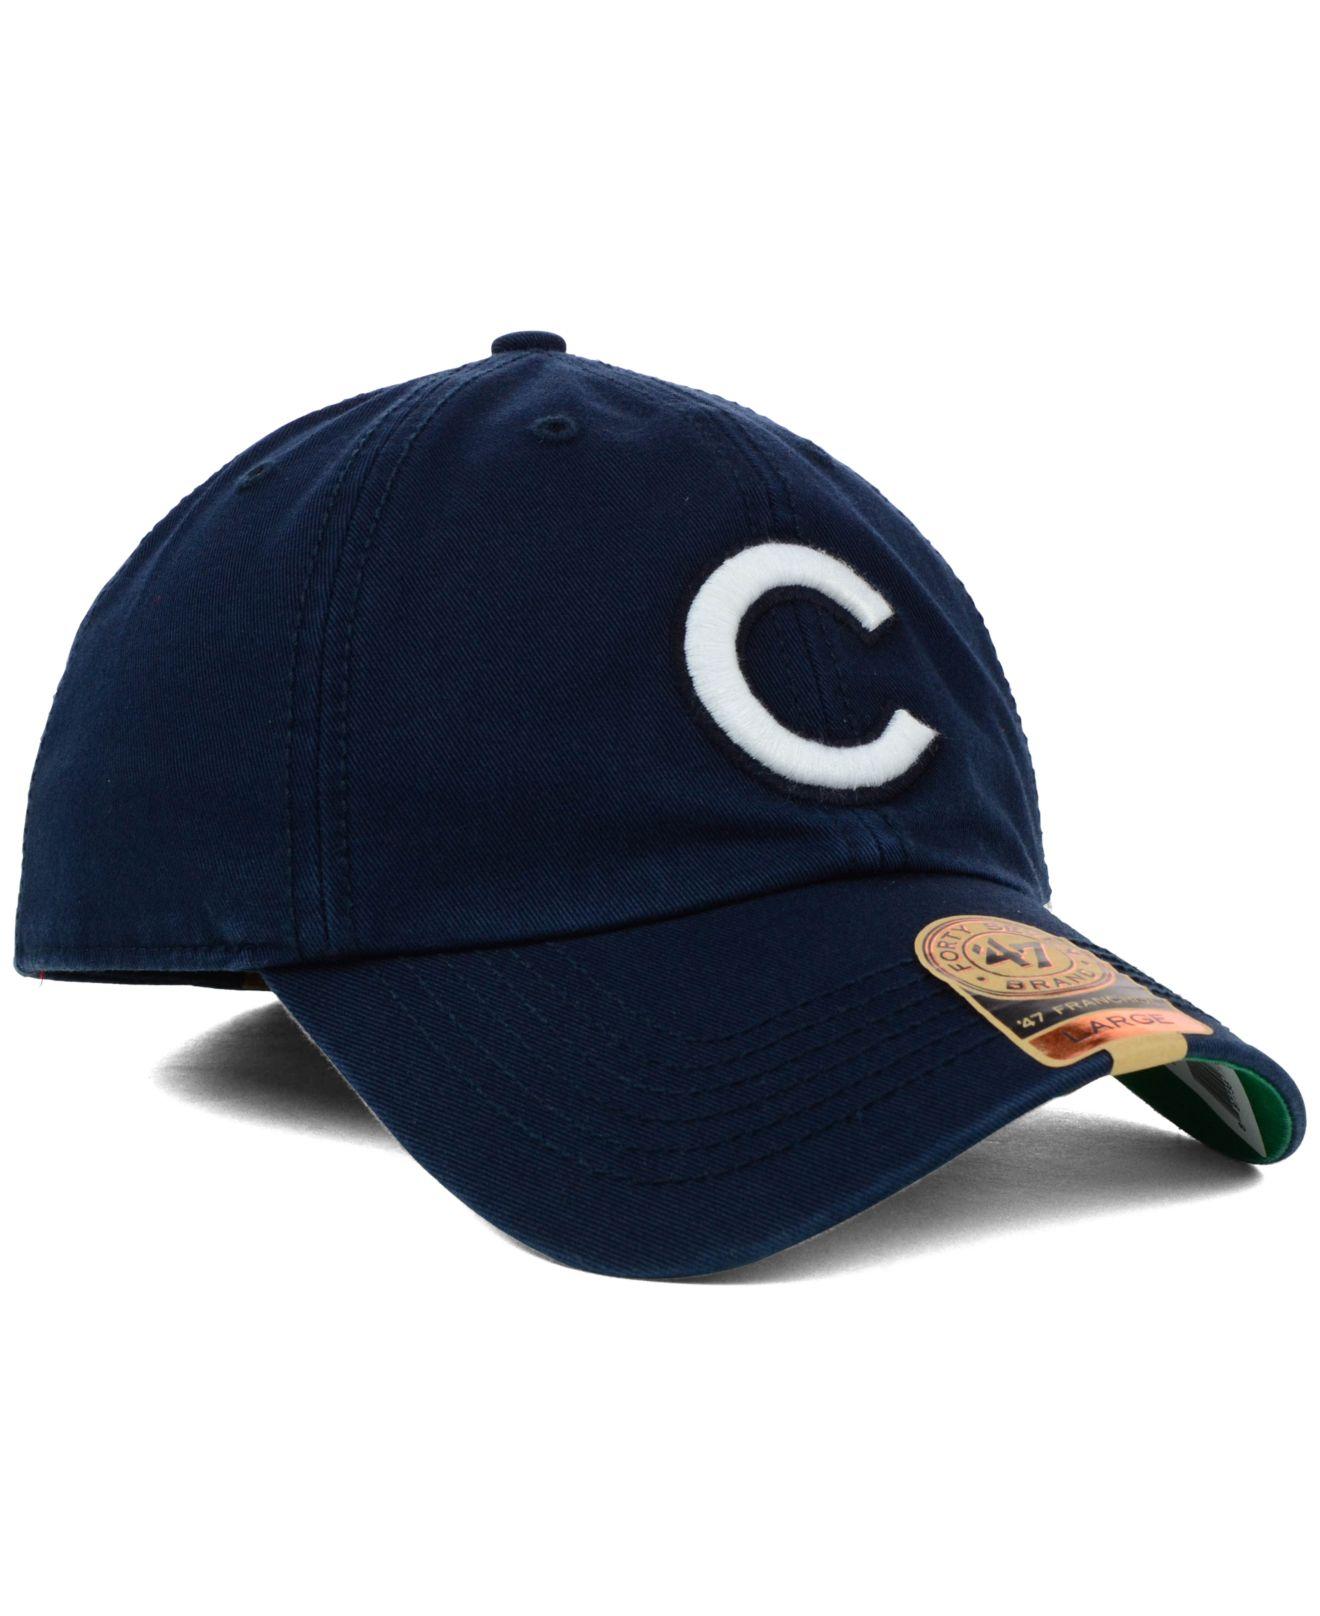 6df1a832b25 Lyst - 47 Brand Chicago Cubs Mlb Harbor Franchise Cap in Blue for Men